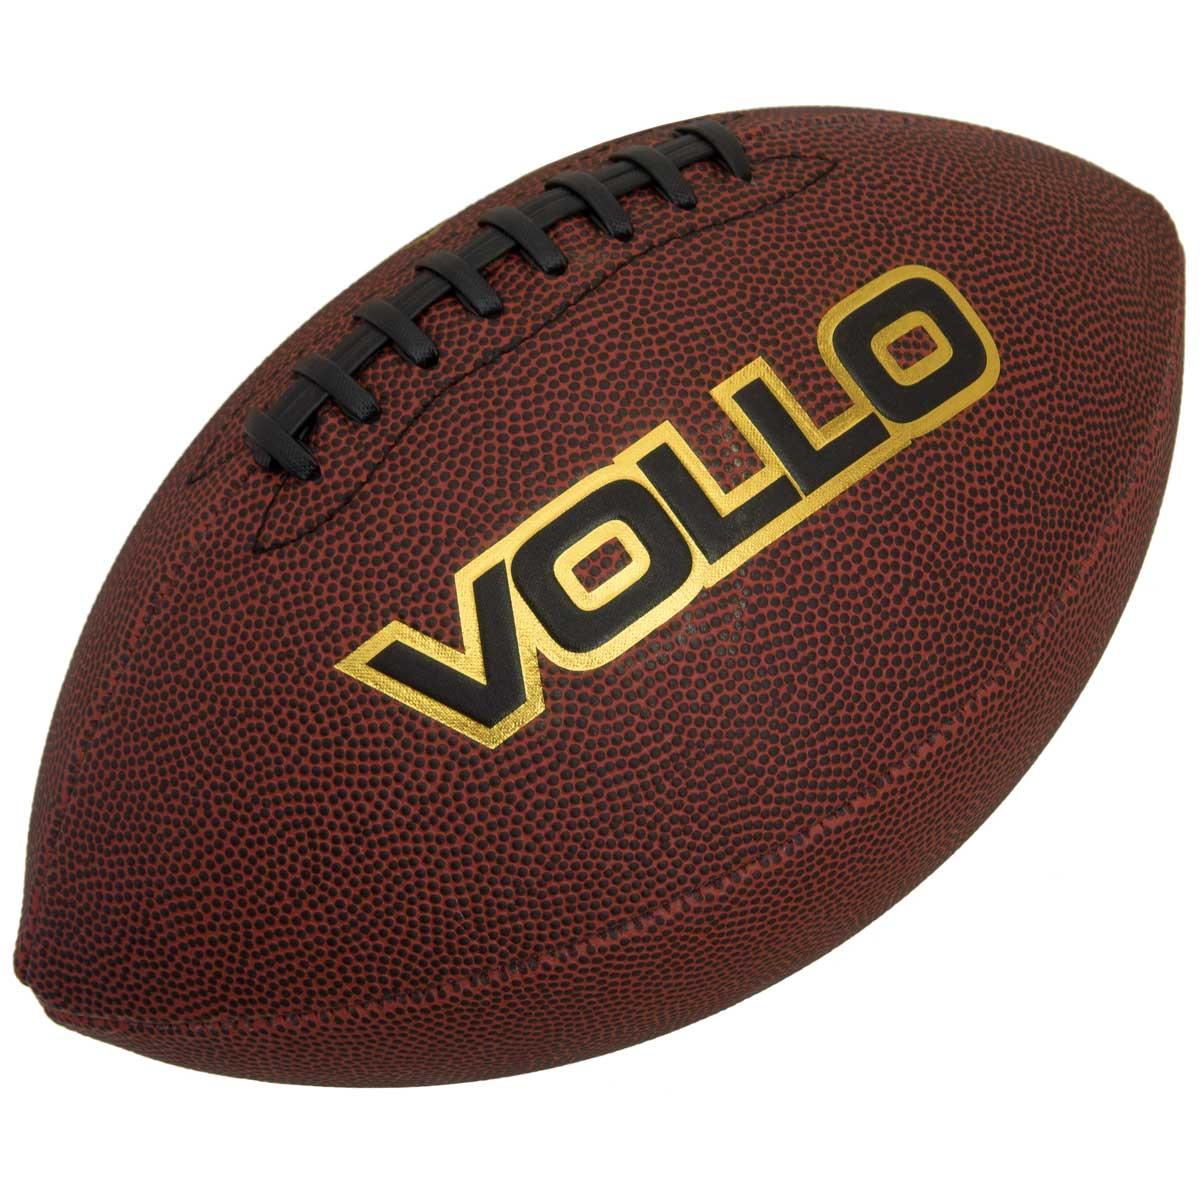 Bola de Futebol Americano Marrom Tamanho Oficial Vollo